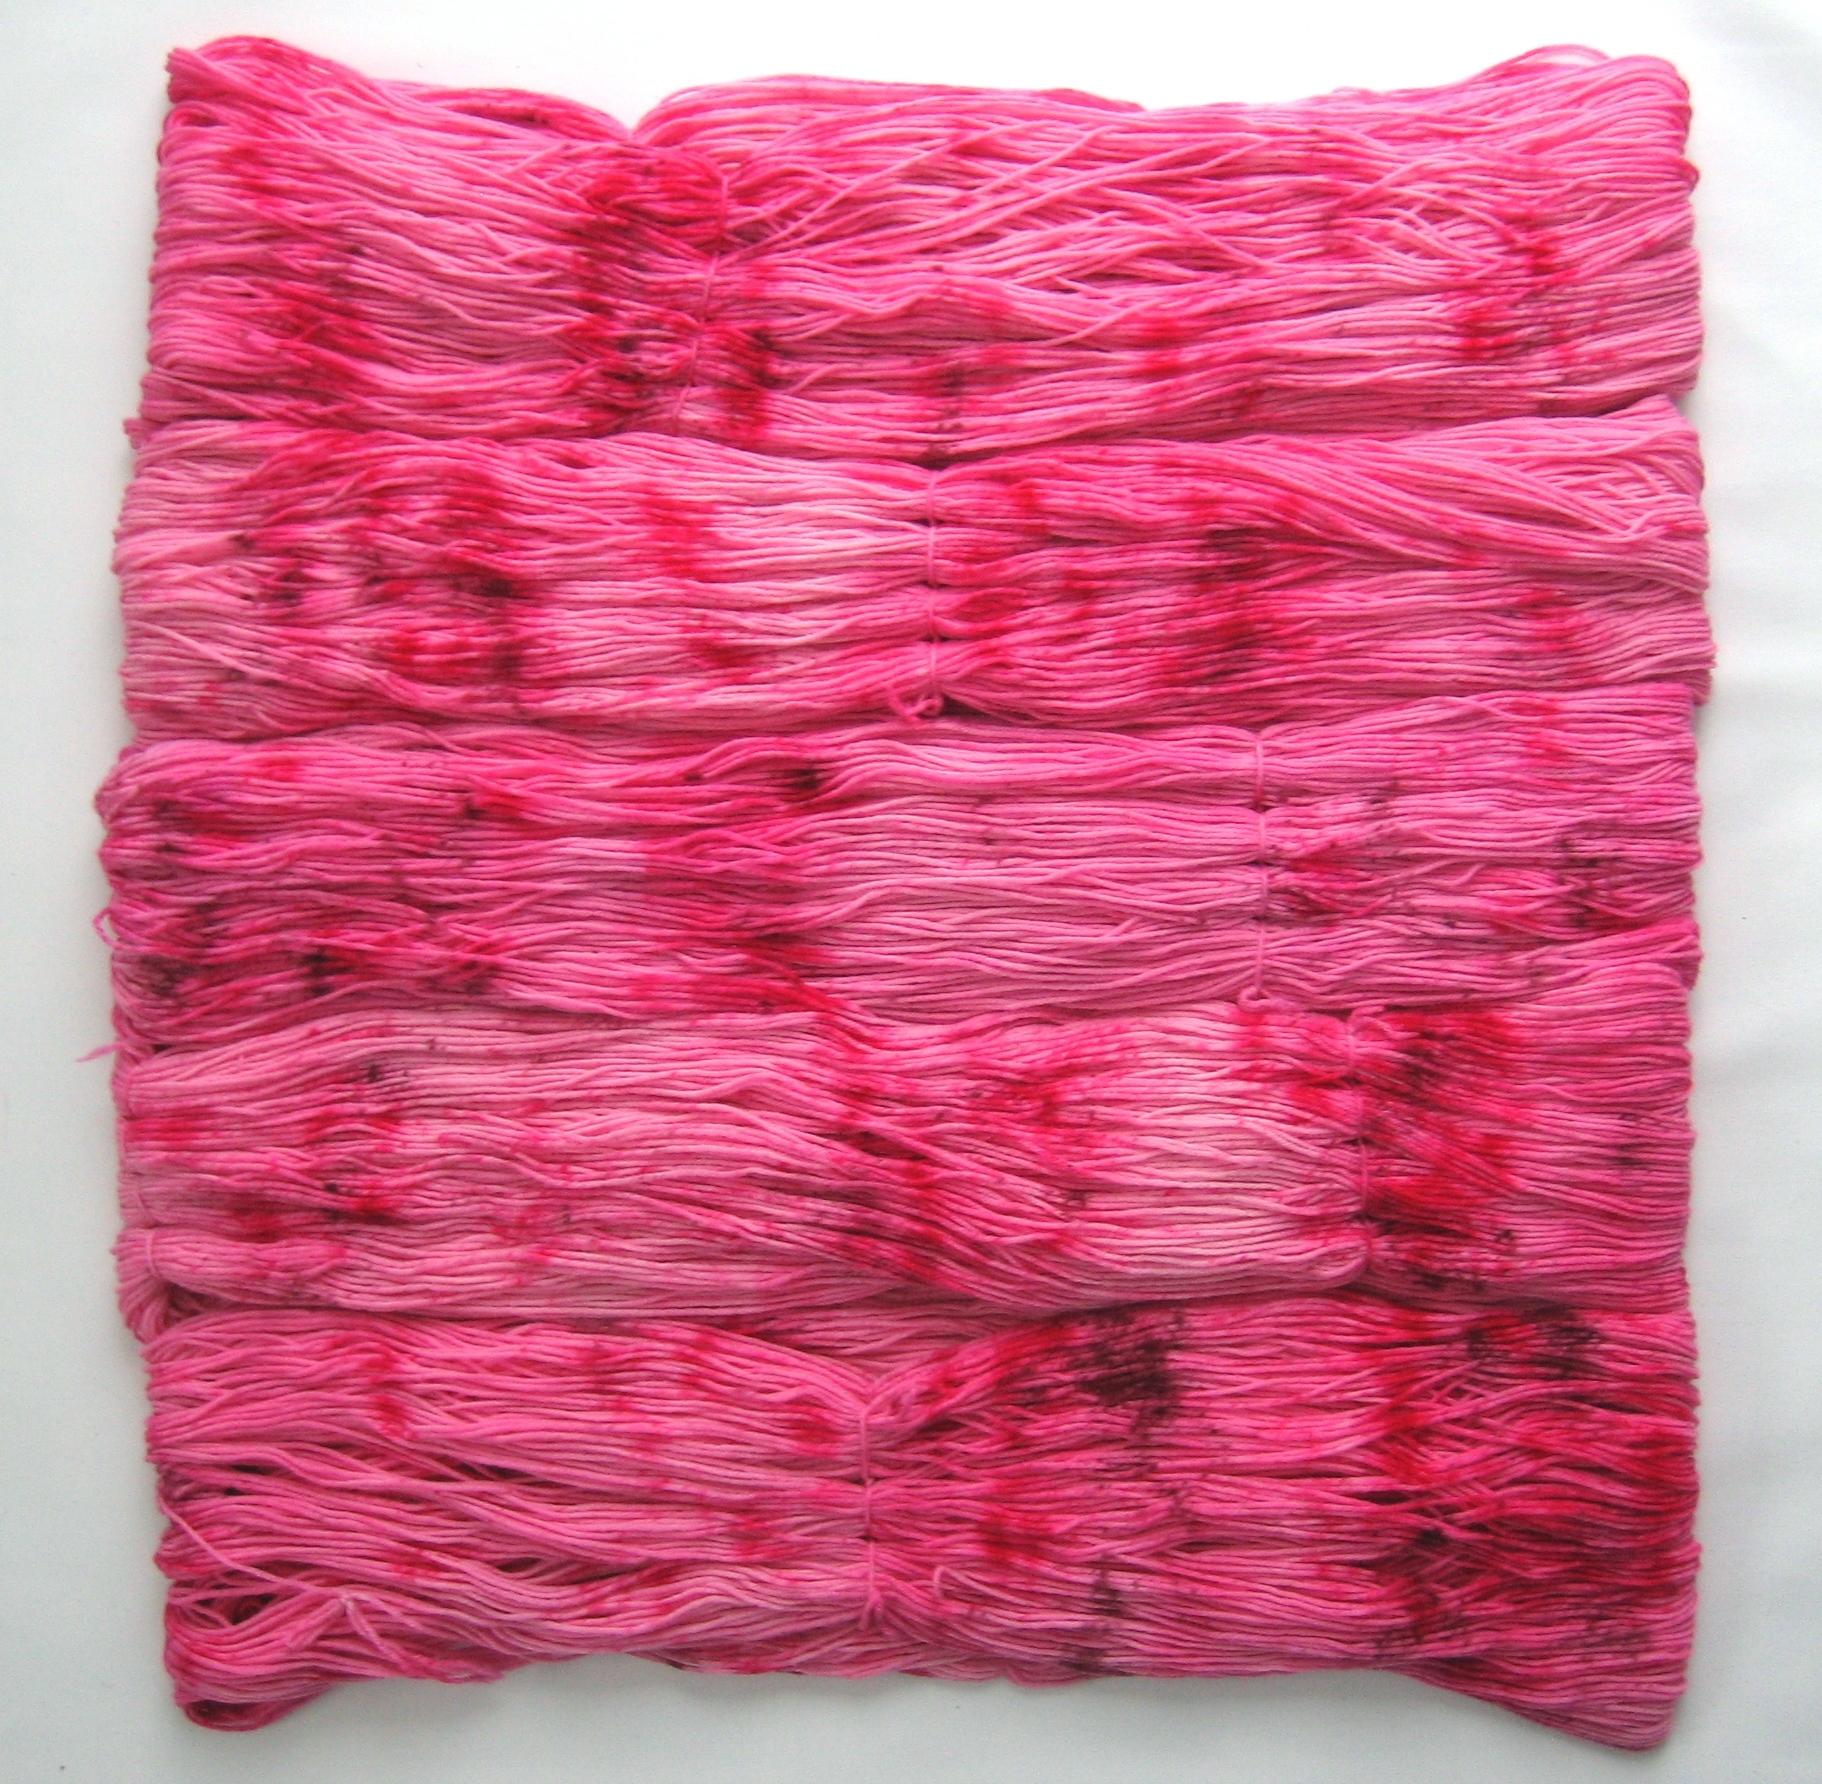 garnyarn-håndfarvet-garn-speckles-tynd-merinould-fingering-baeredygtig-lyseroed-pink